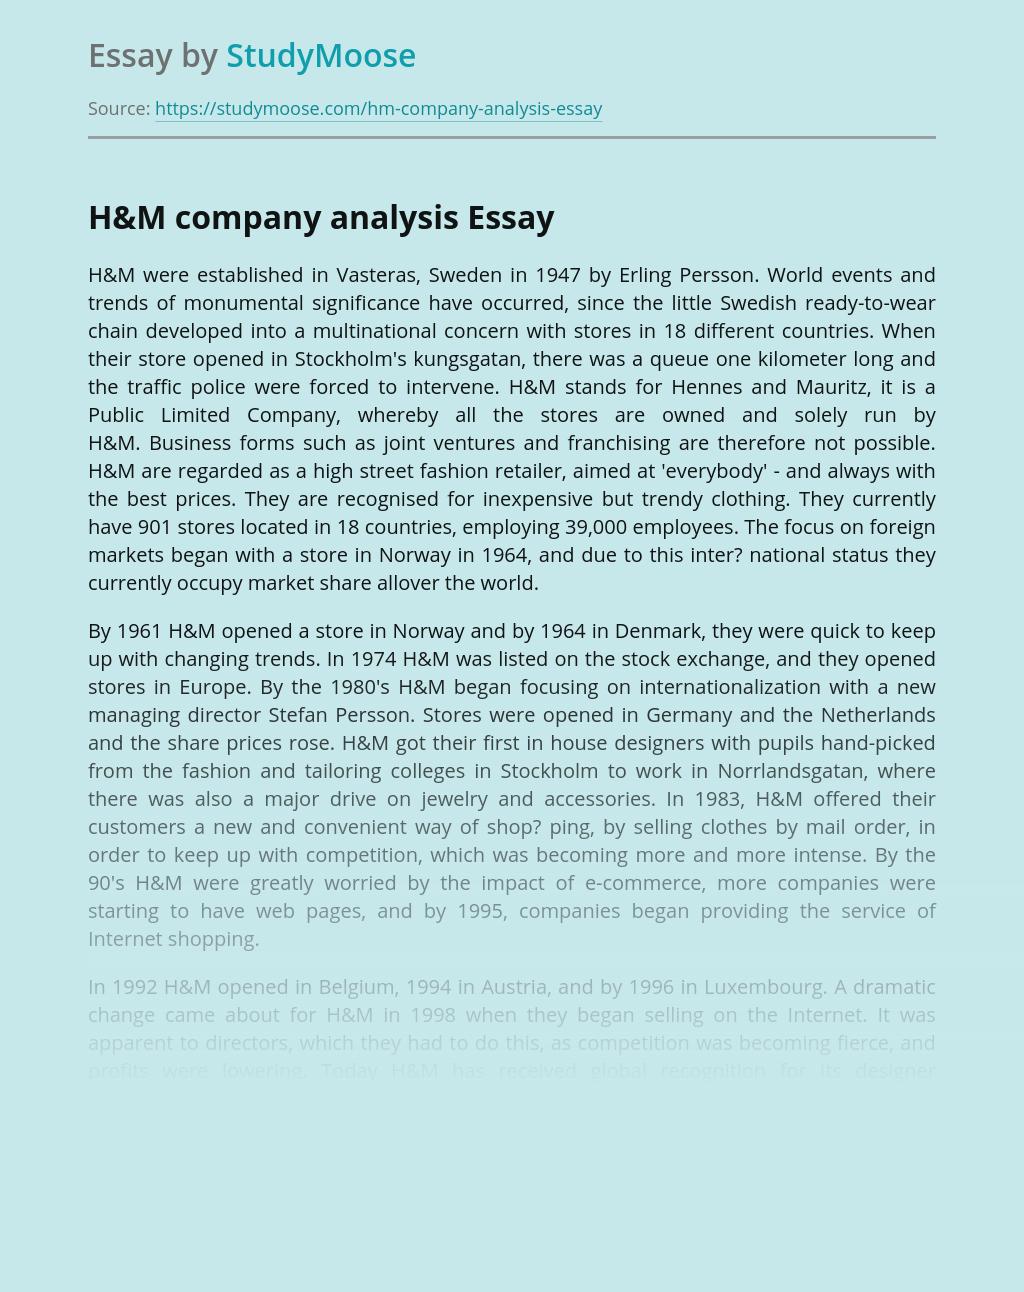 H&M company analysis